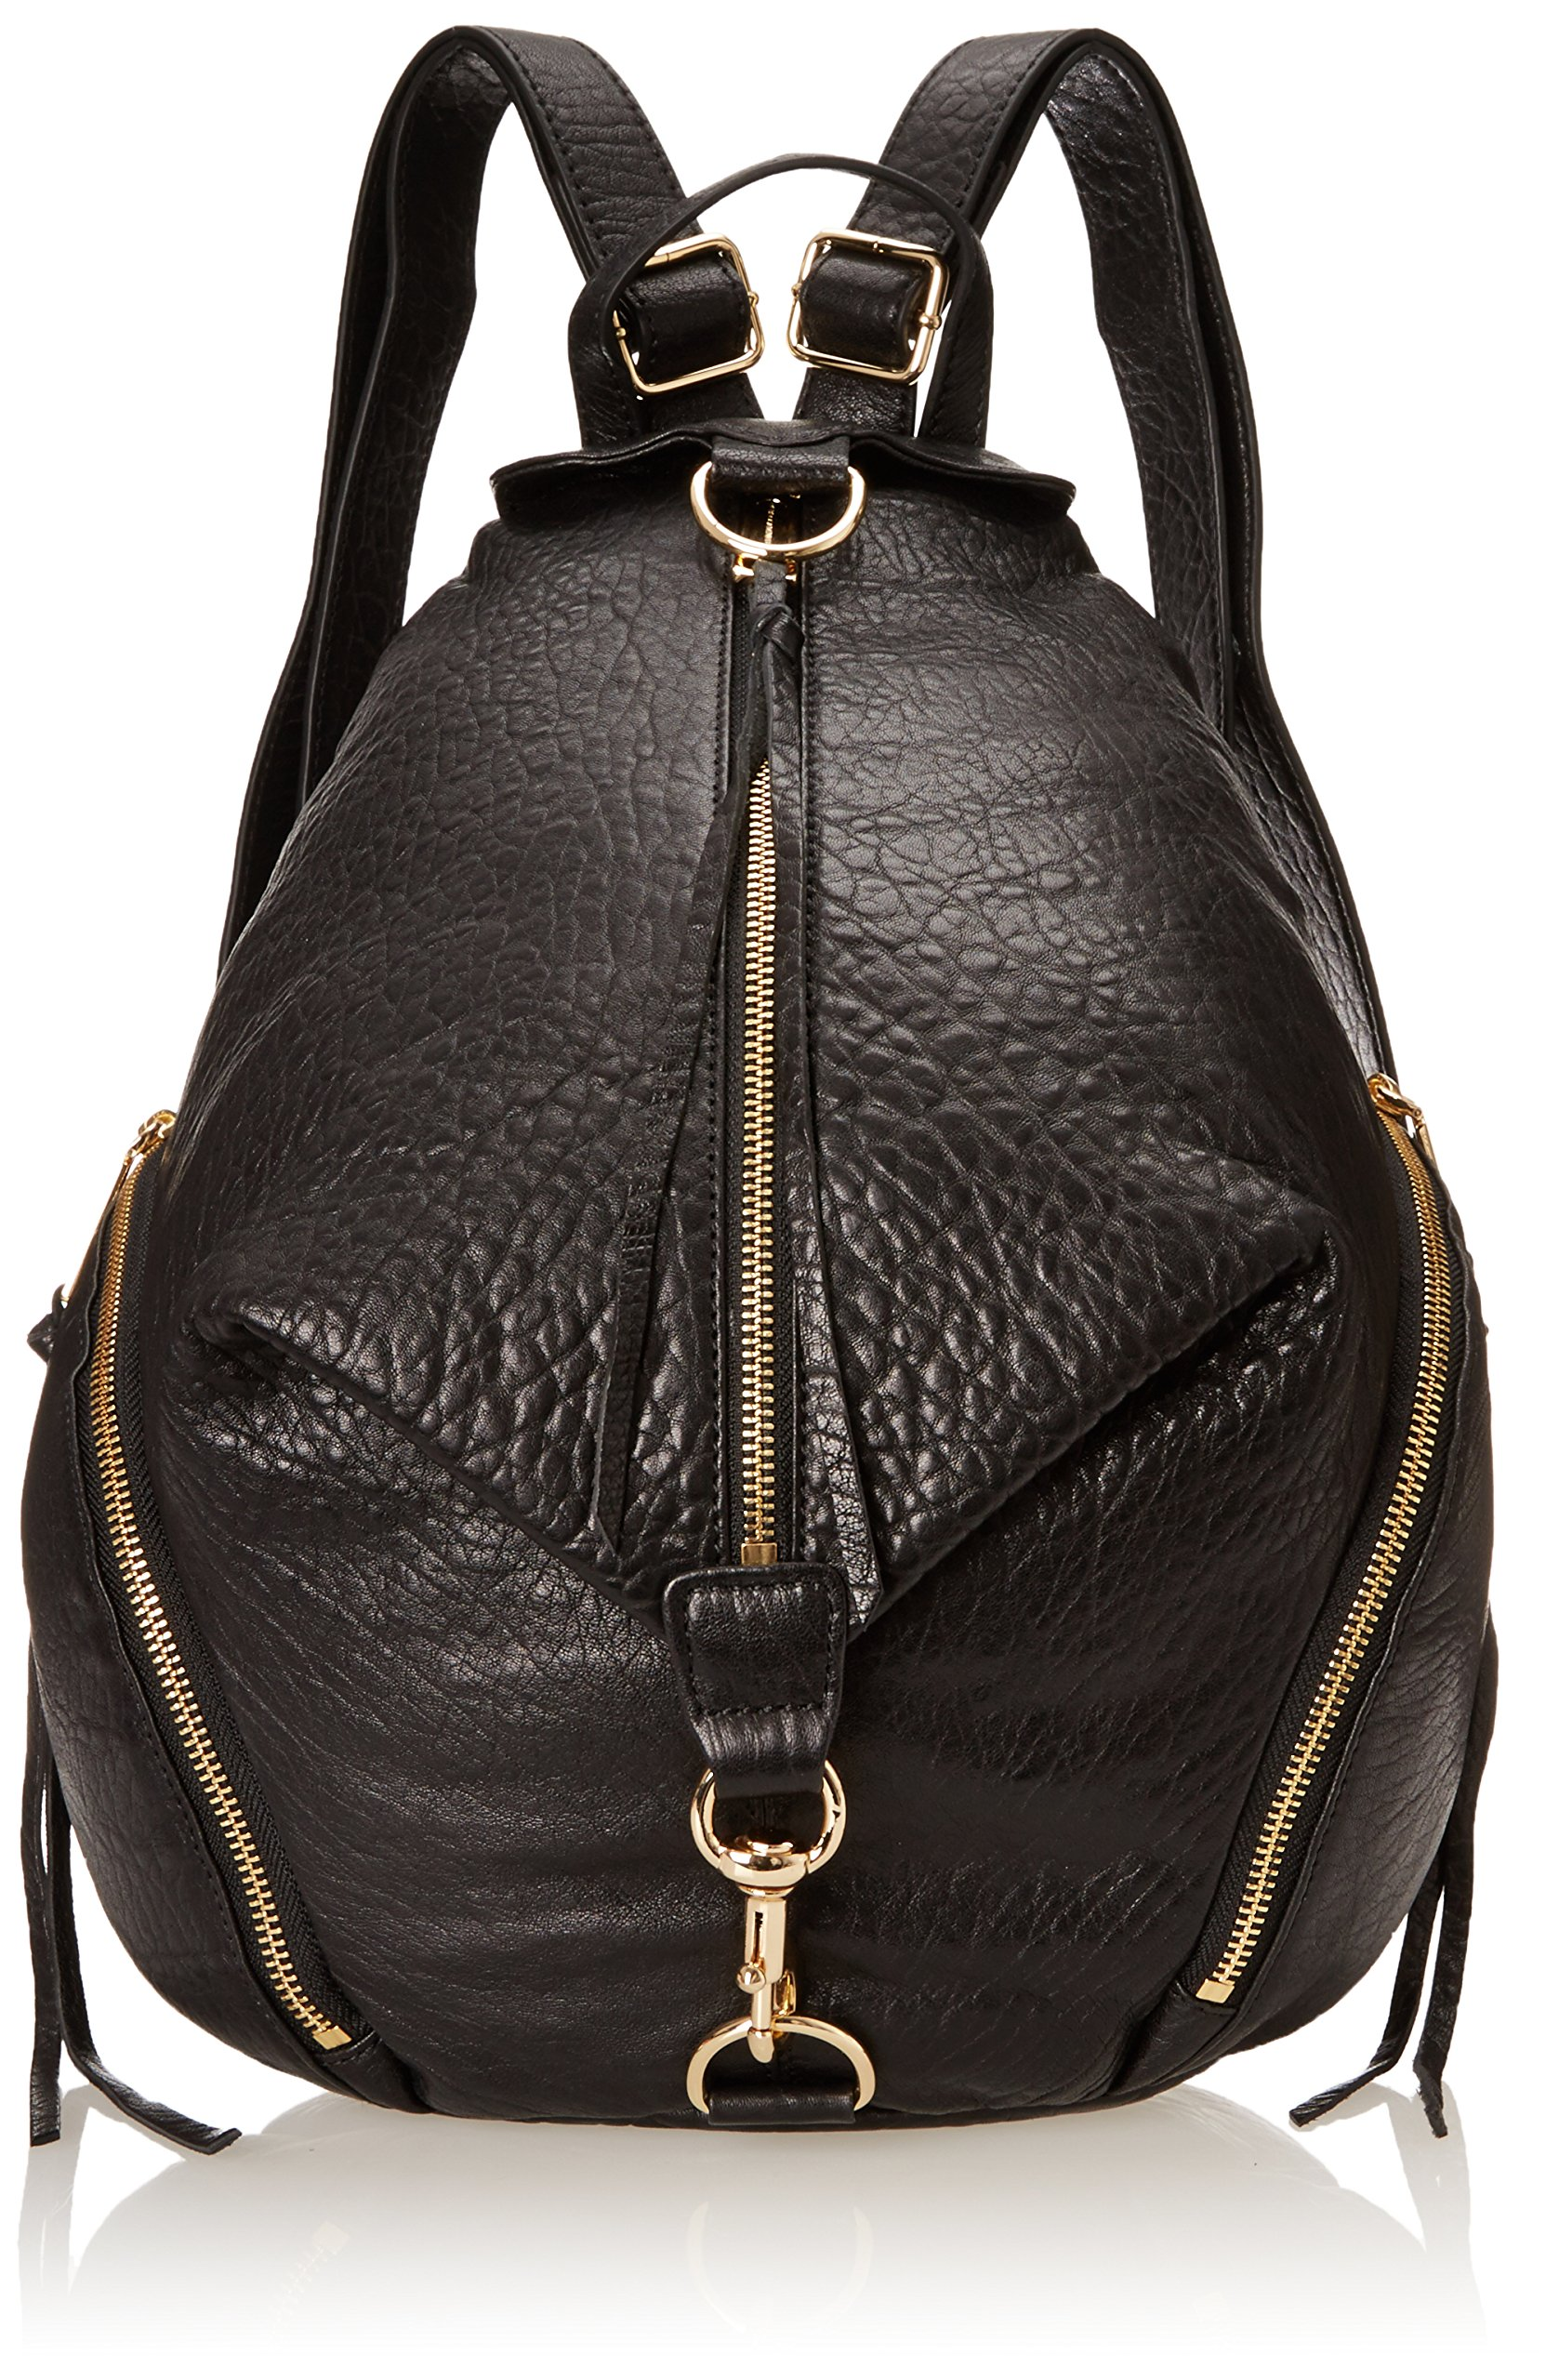 Rebecca Minkoff Julian Backpack Handbag, Black/Black,One Size